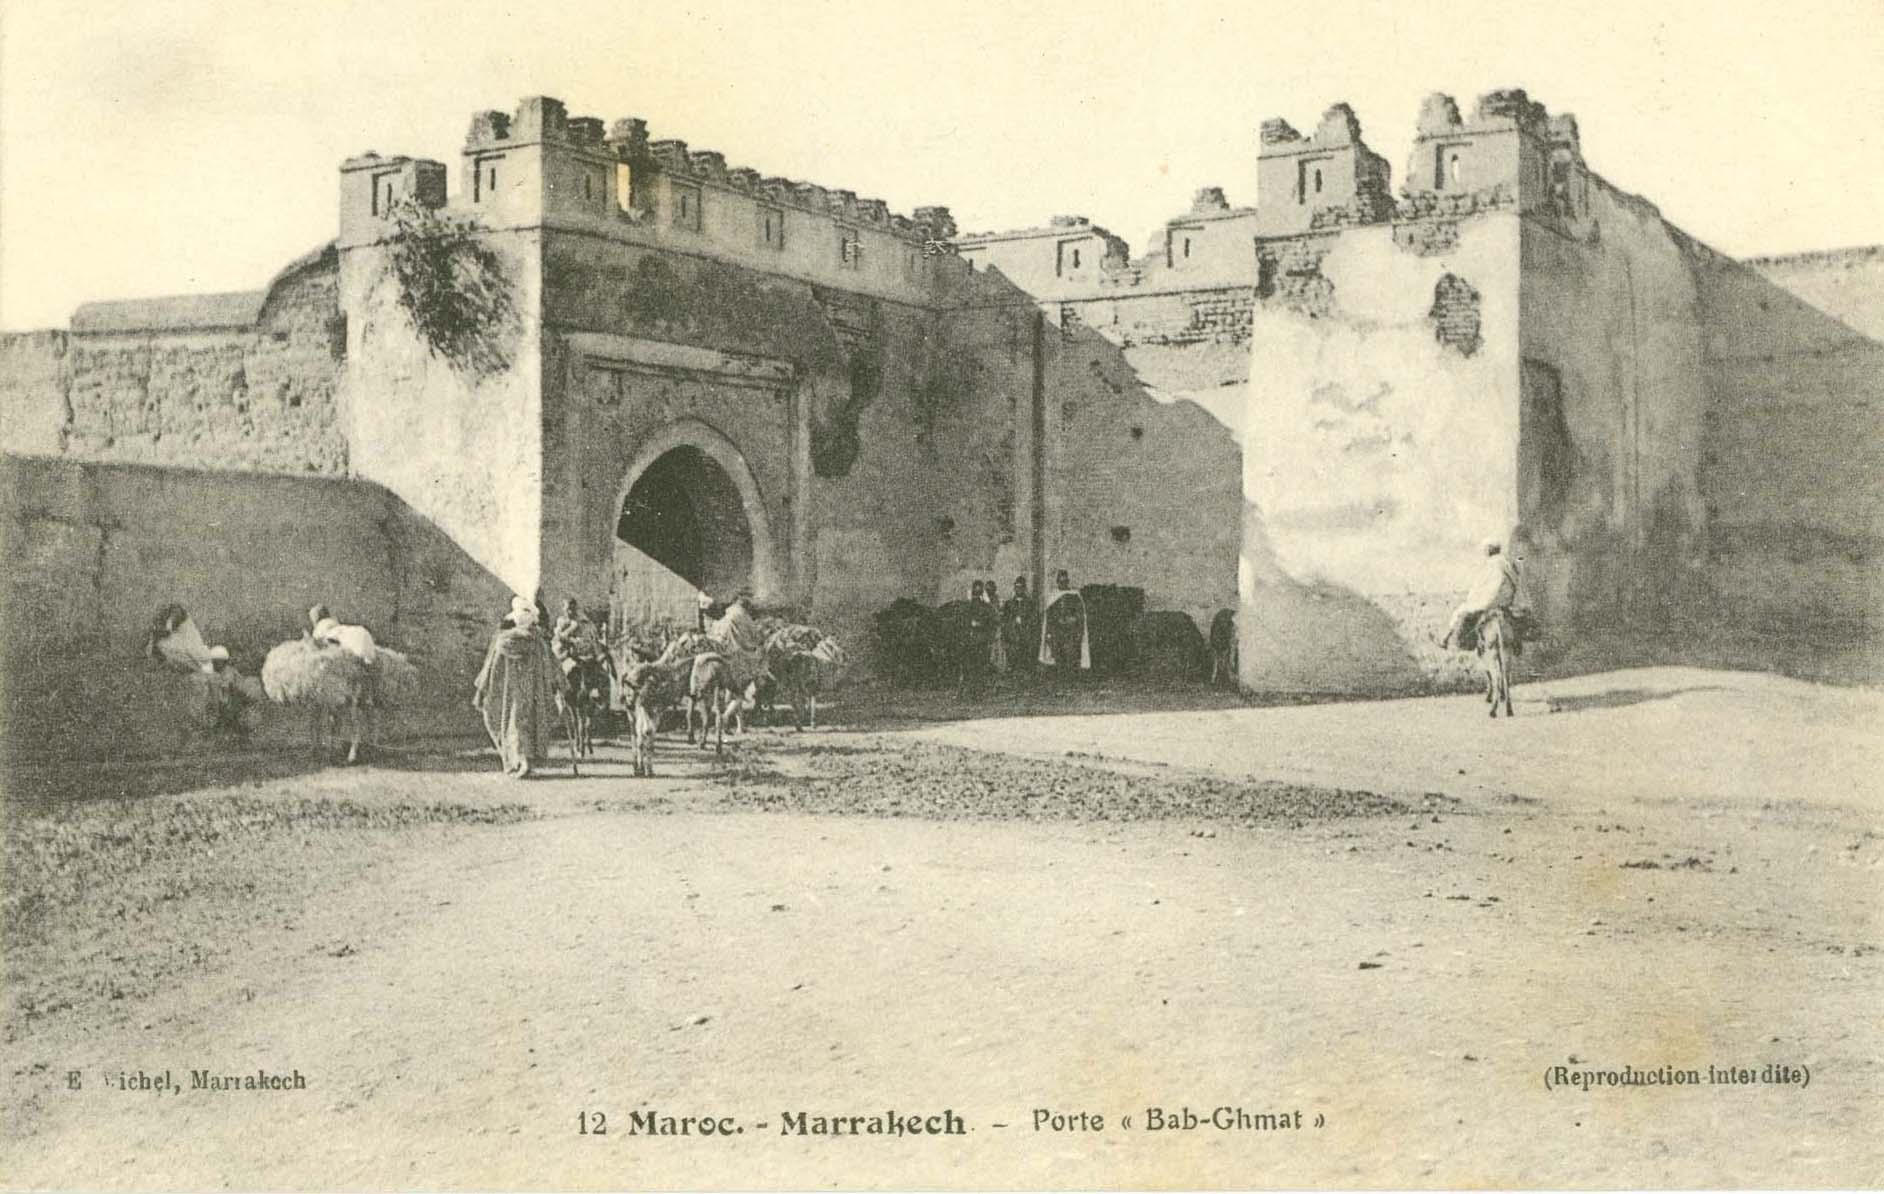 bab ghmat marrakech ancienne photo © E Michel